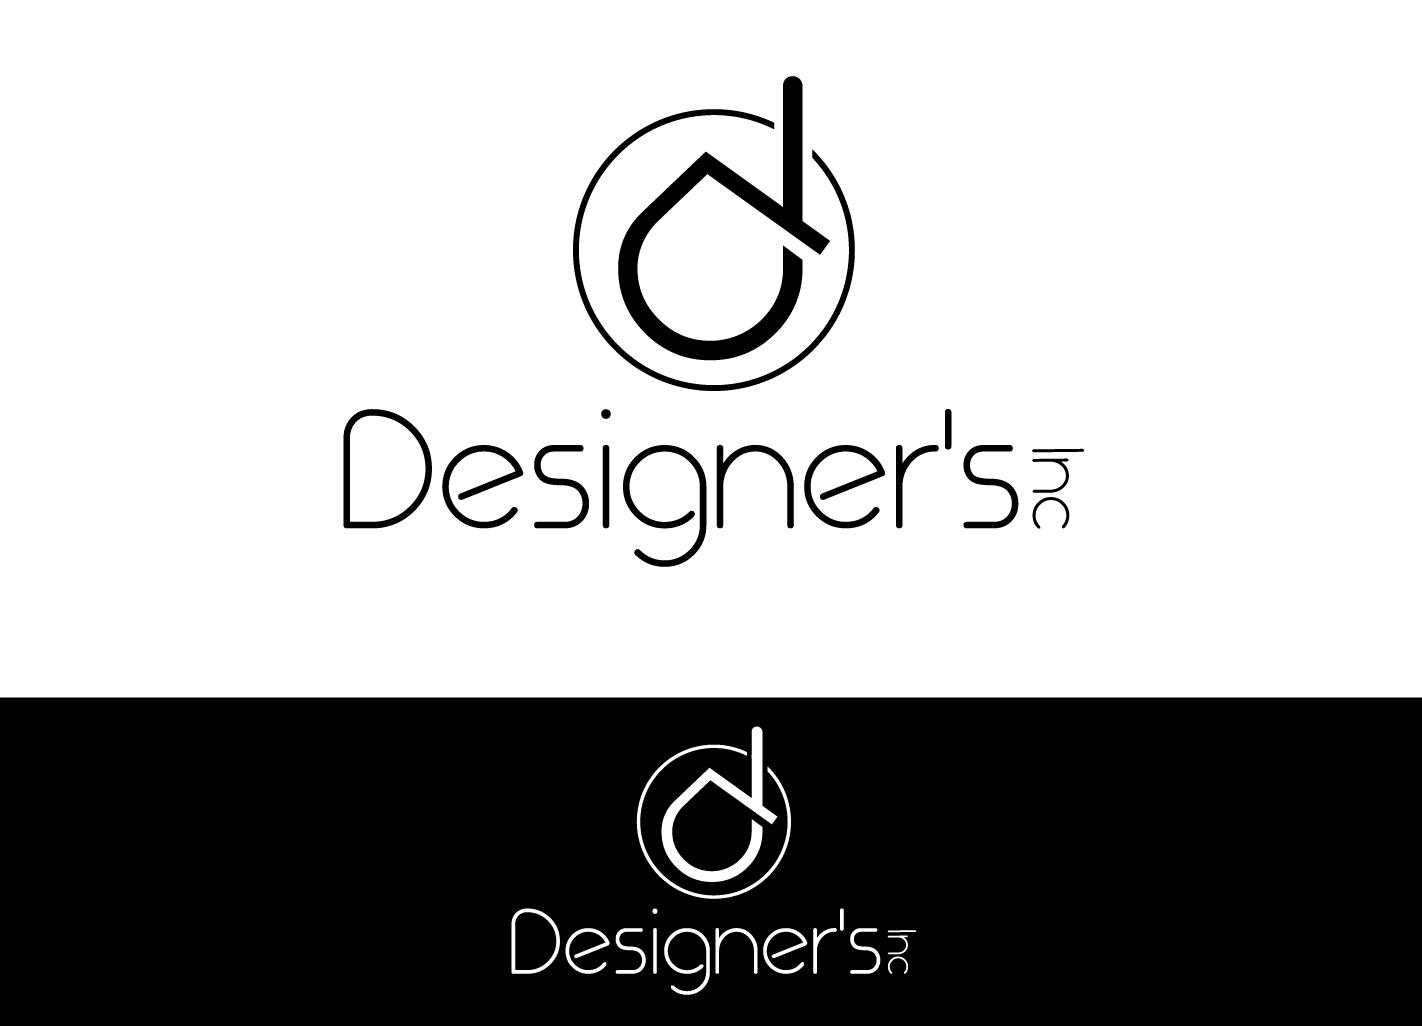 Modern professional logo design for geraldine lim by hih7 for Design agency singapore